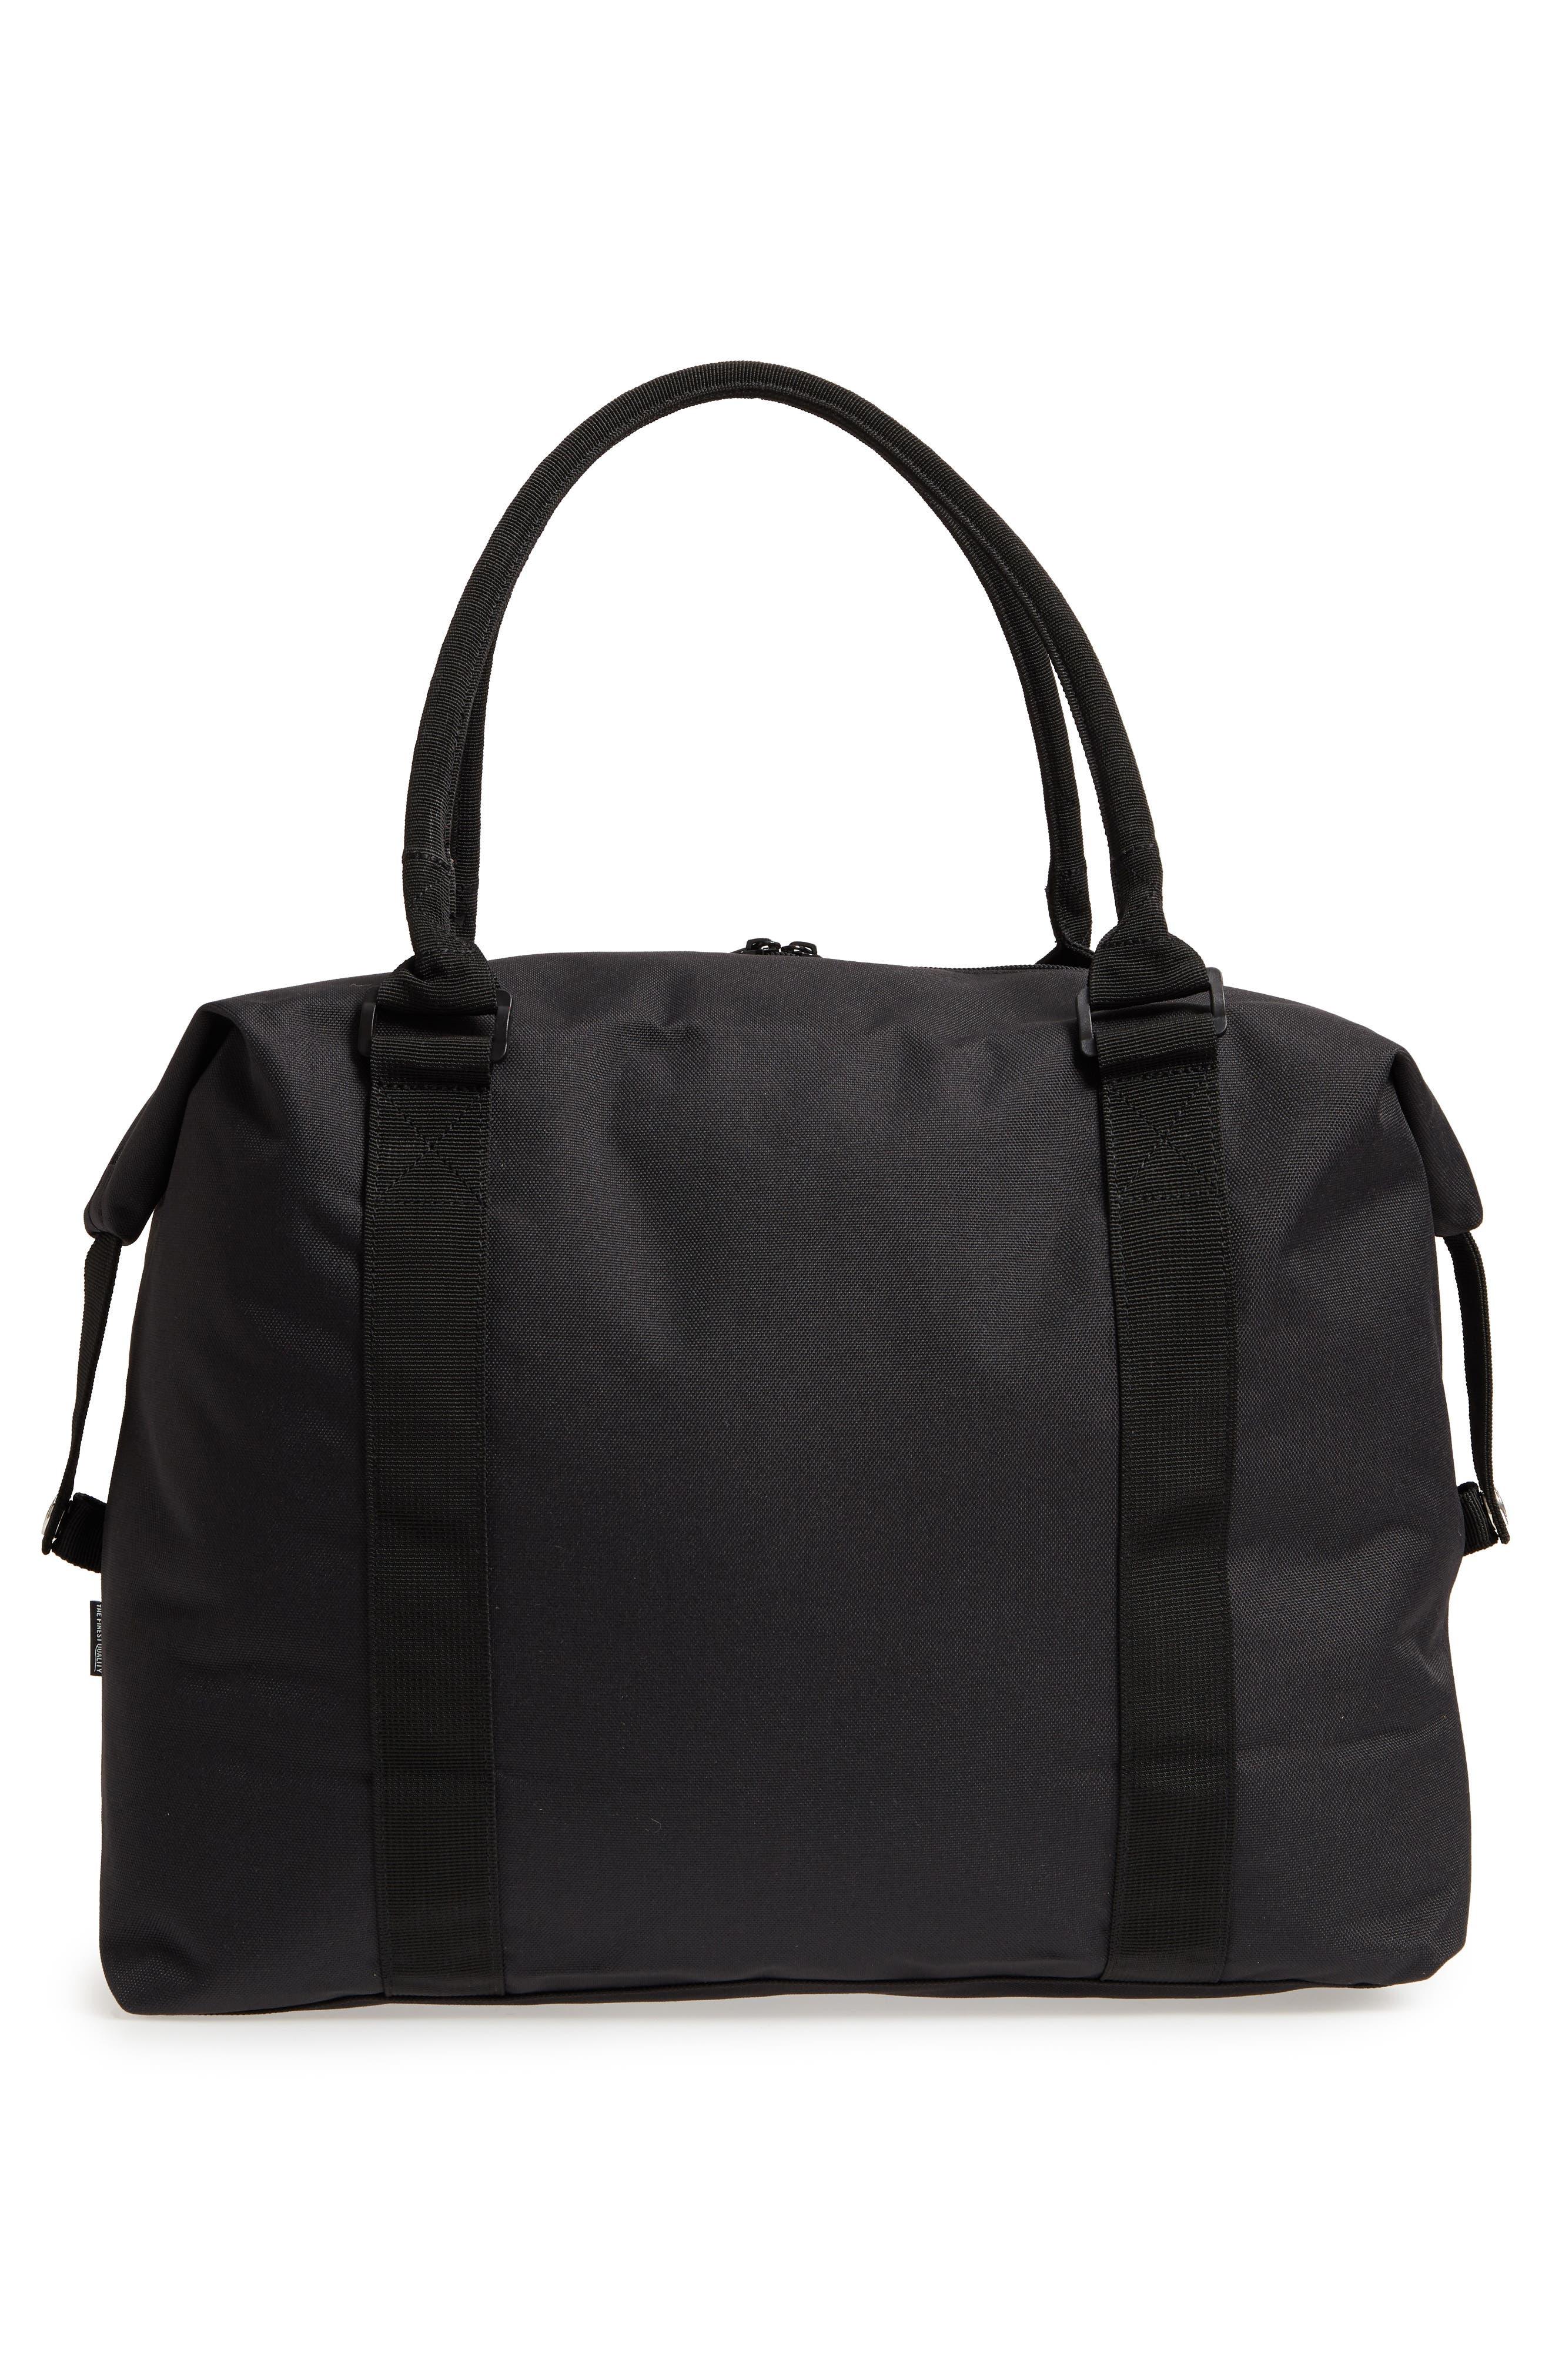 Strand Duffel Bag,                             Alternate thumbnail 3, color,                             Black